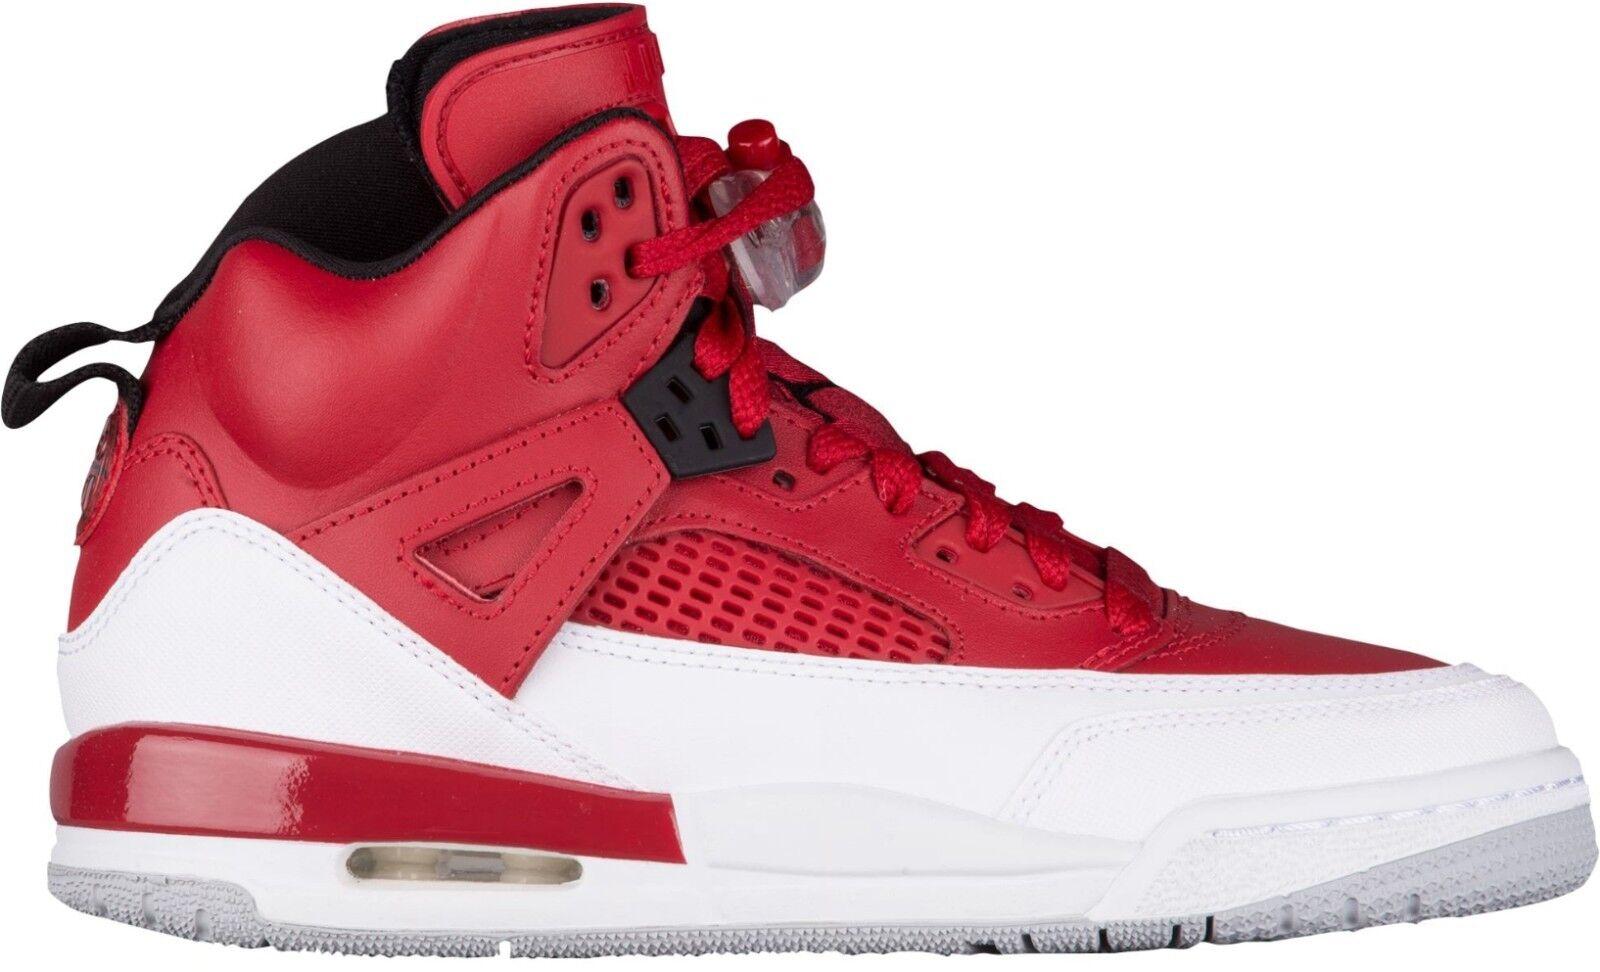 Nike air jordan spizike uomini scarpe palestra rosso / nero 315371-603 b